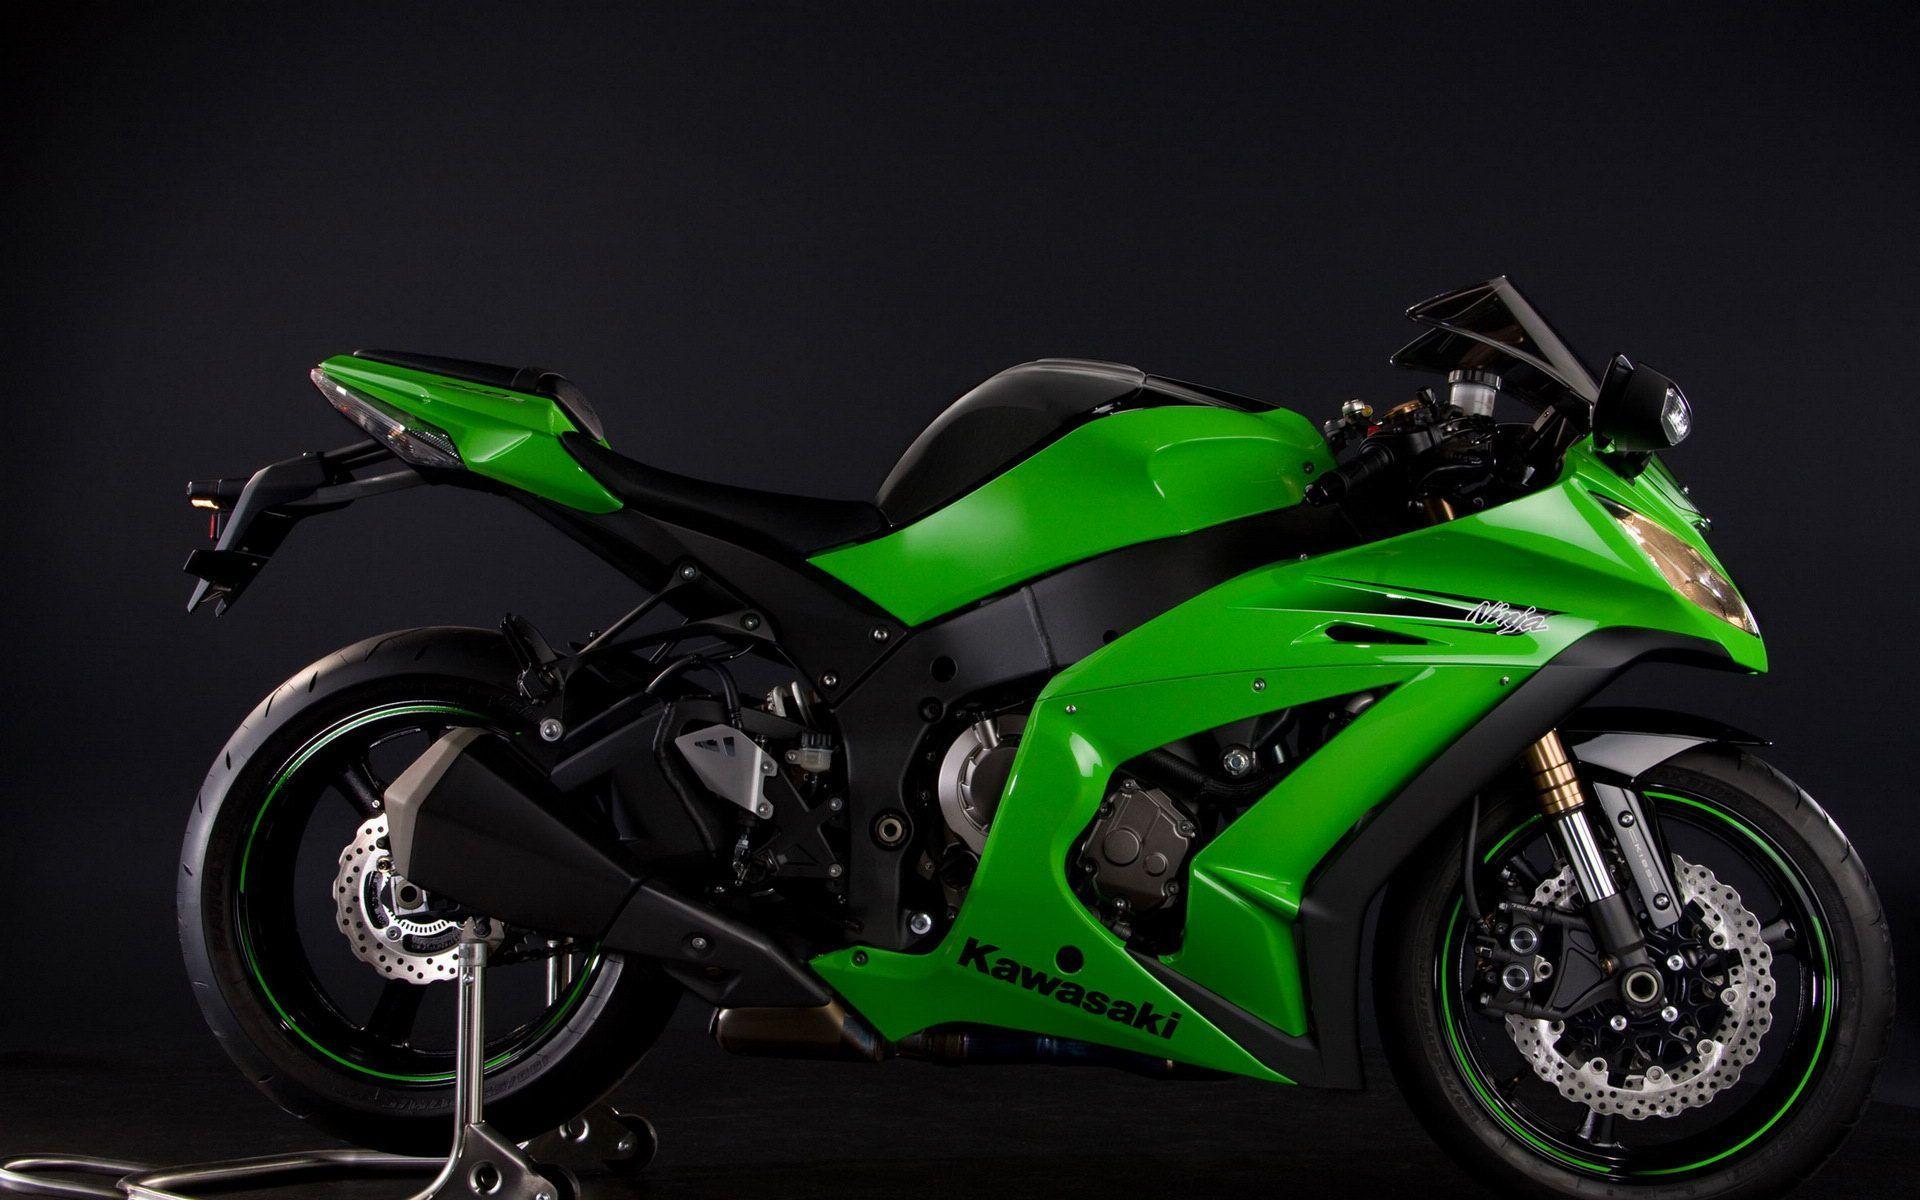 Kawasaki Ninja Wallpaper Hd Http Motorcyclecarz Com Kawasaki Ninja Wallpaper Hd Kawasaki Ninja Ninja Motor Kawasaki